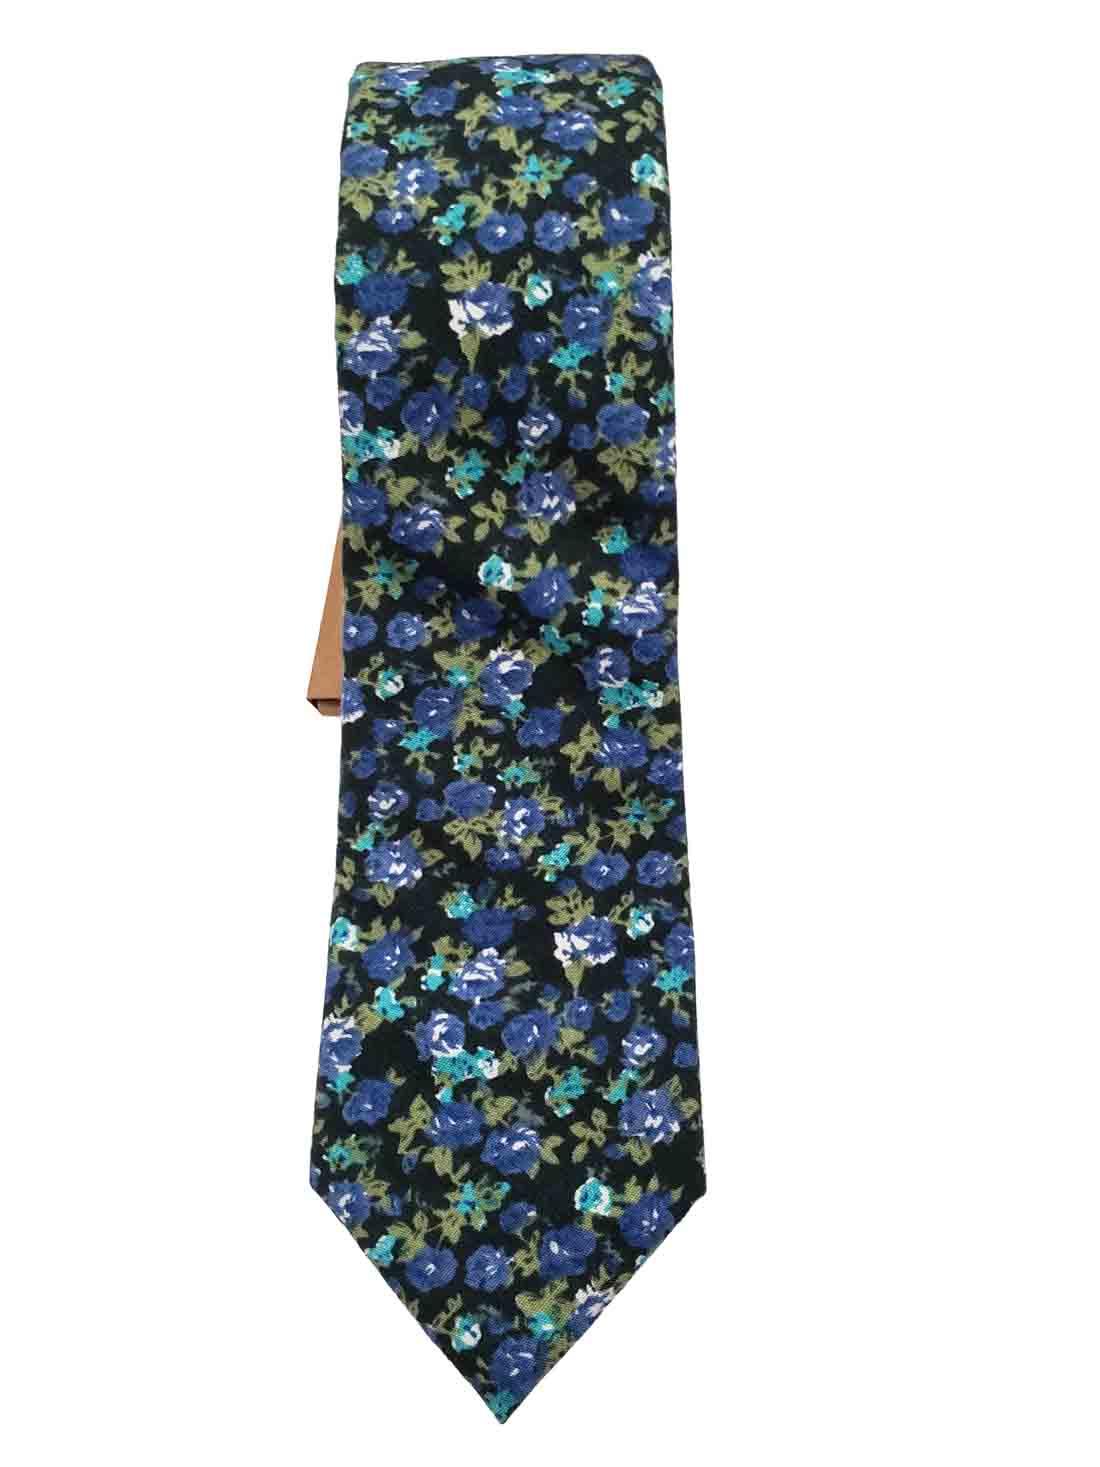 Floral Cotton Tie Narrow Blue Green Teal White Black Men's